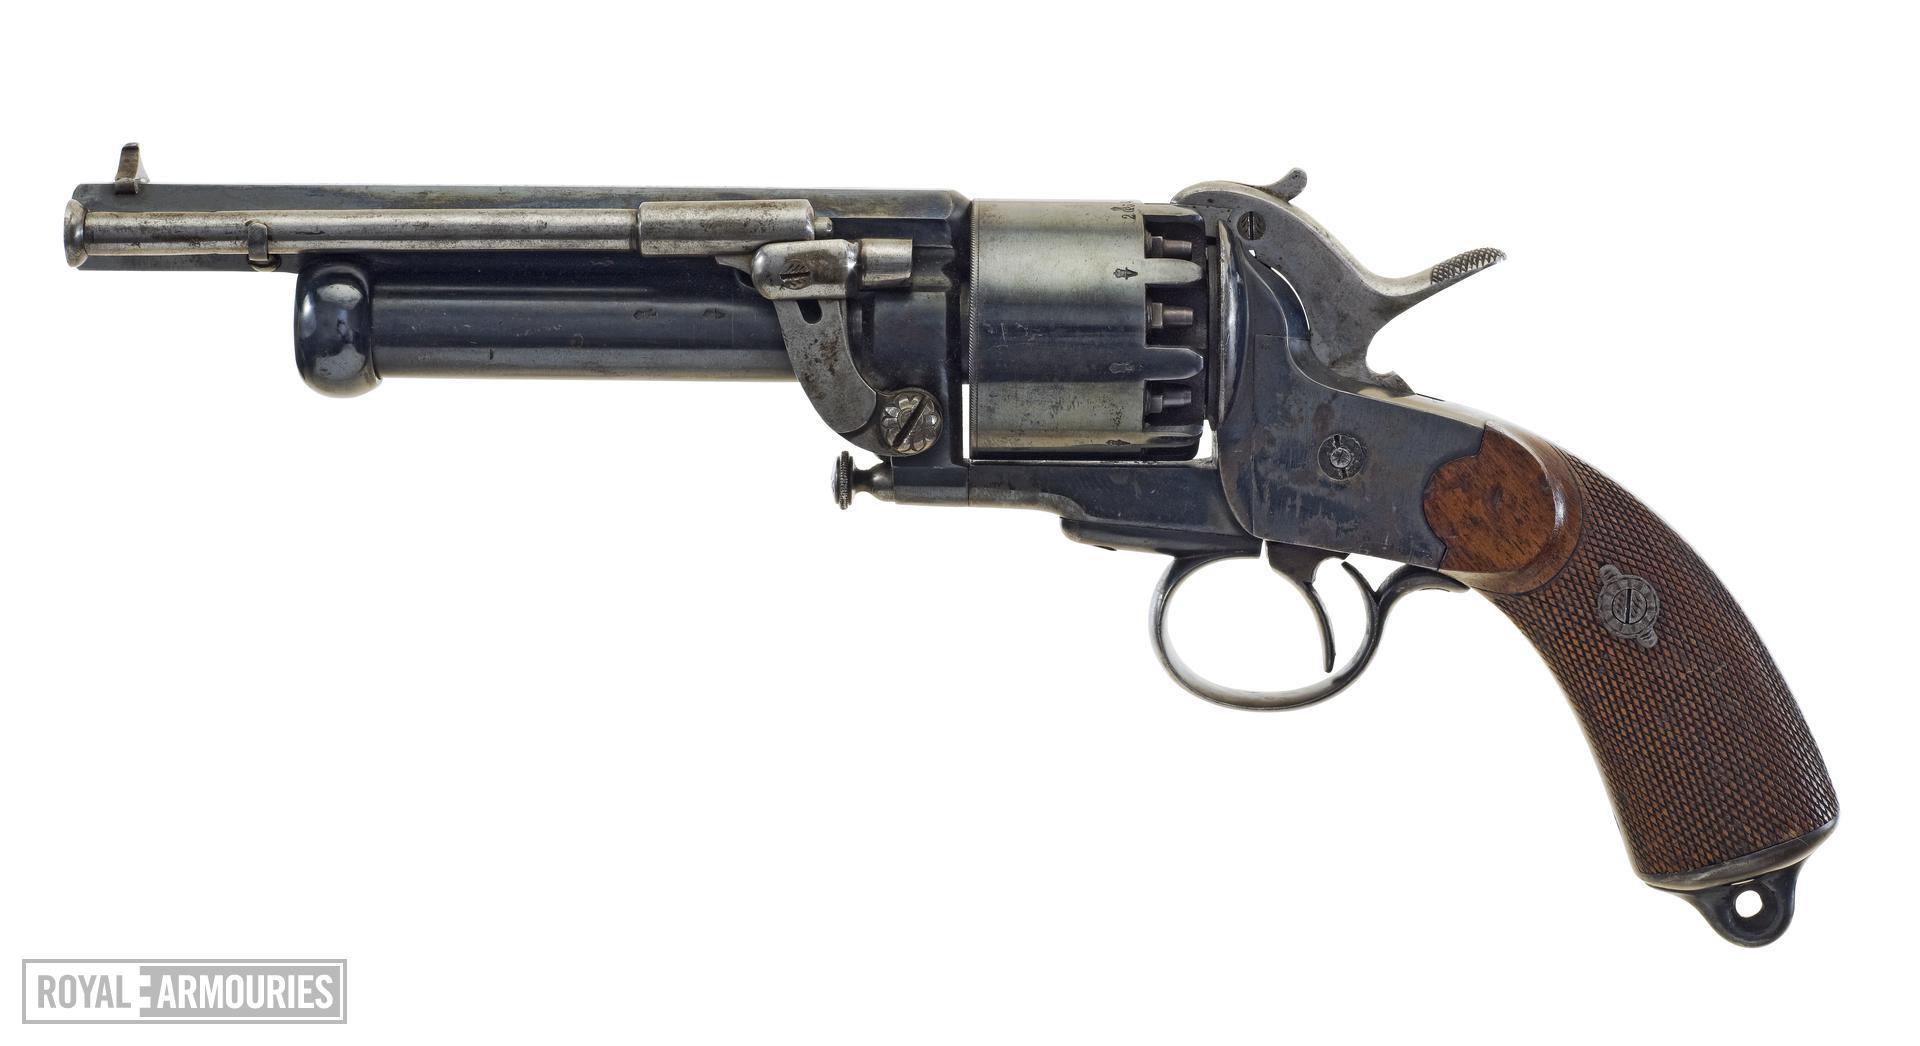 Percussion nine-shot revolver and shot pistol - Le Mat